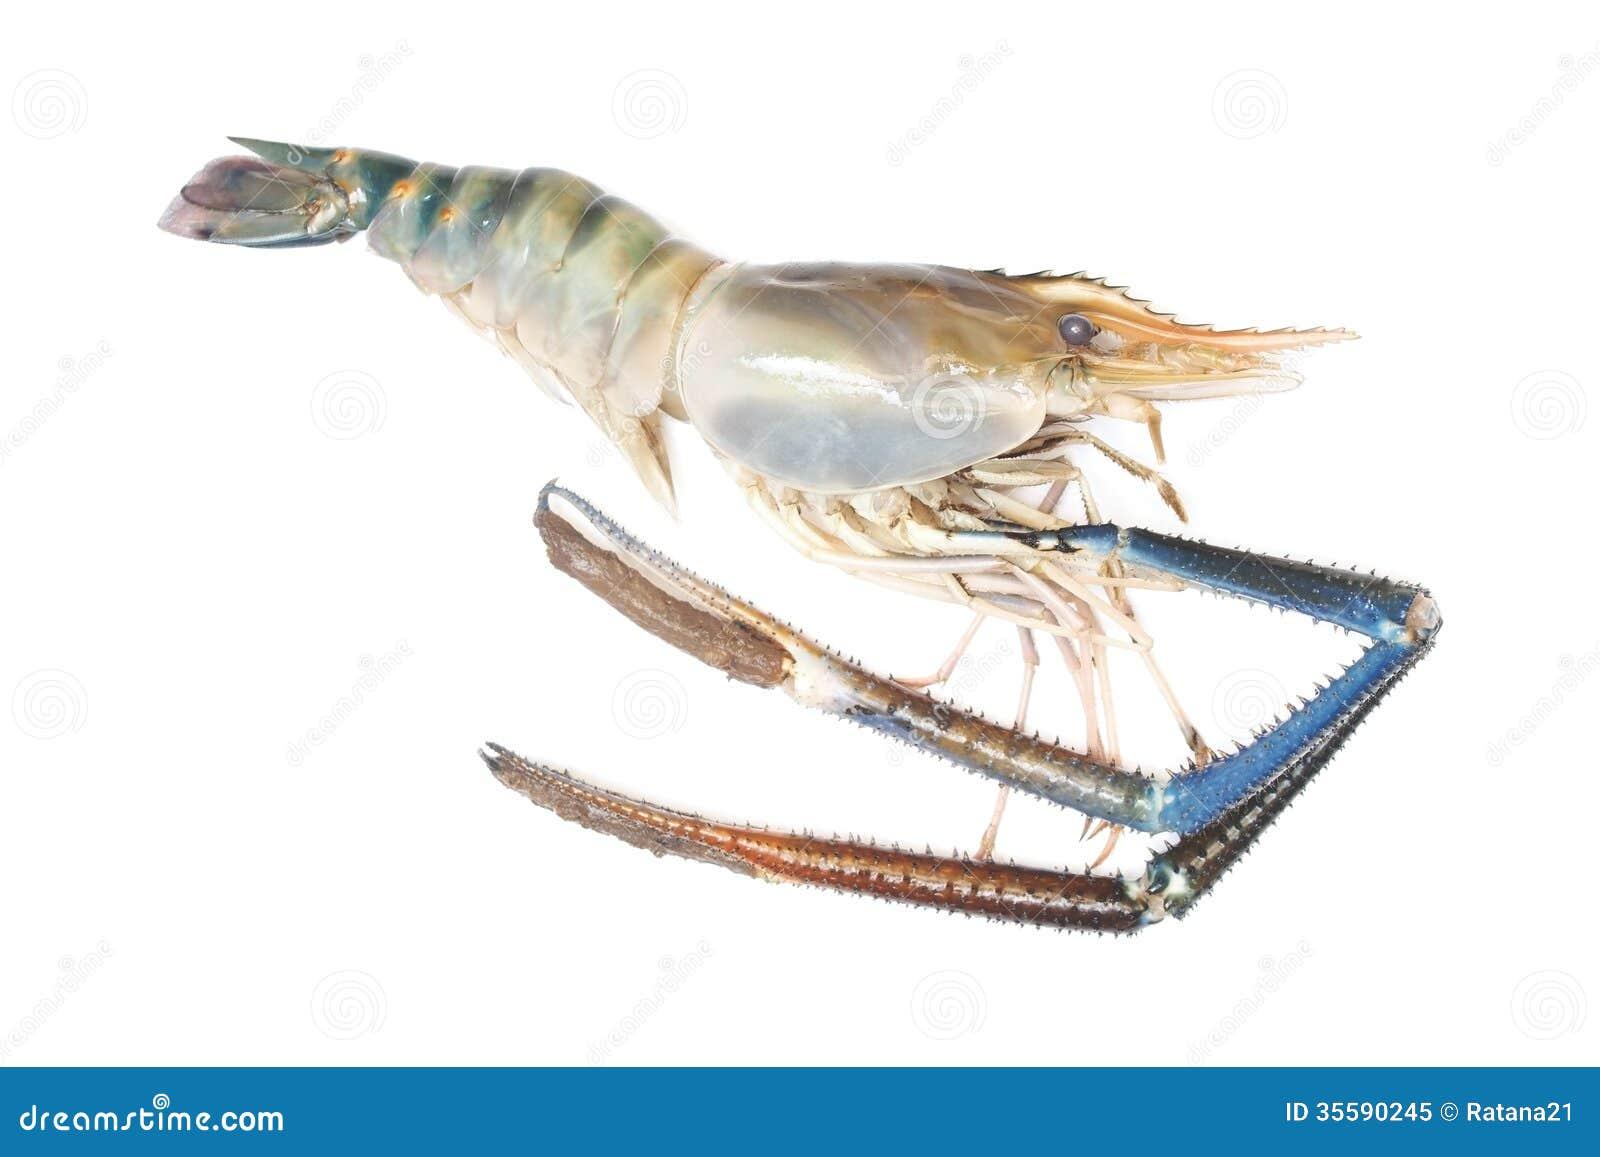 Giant Freshwater Prawn stock image  Image of nature, seafood